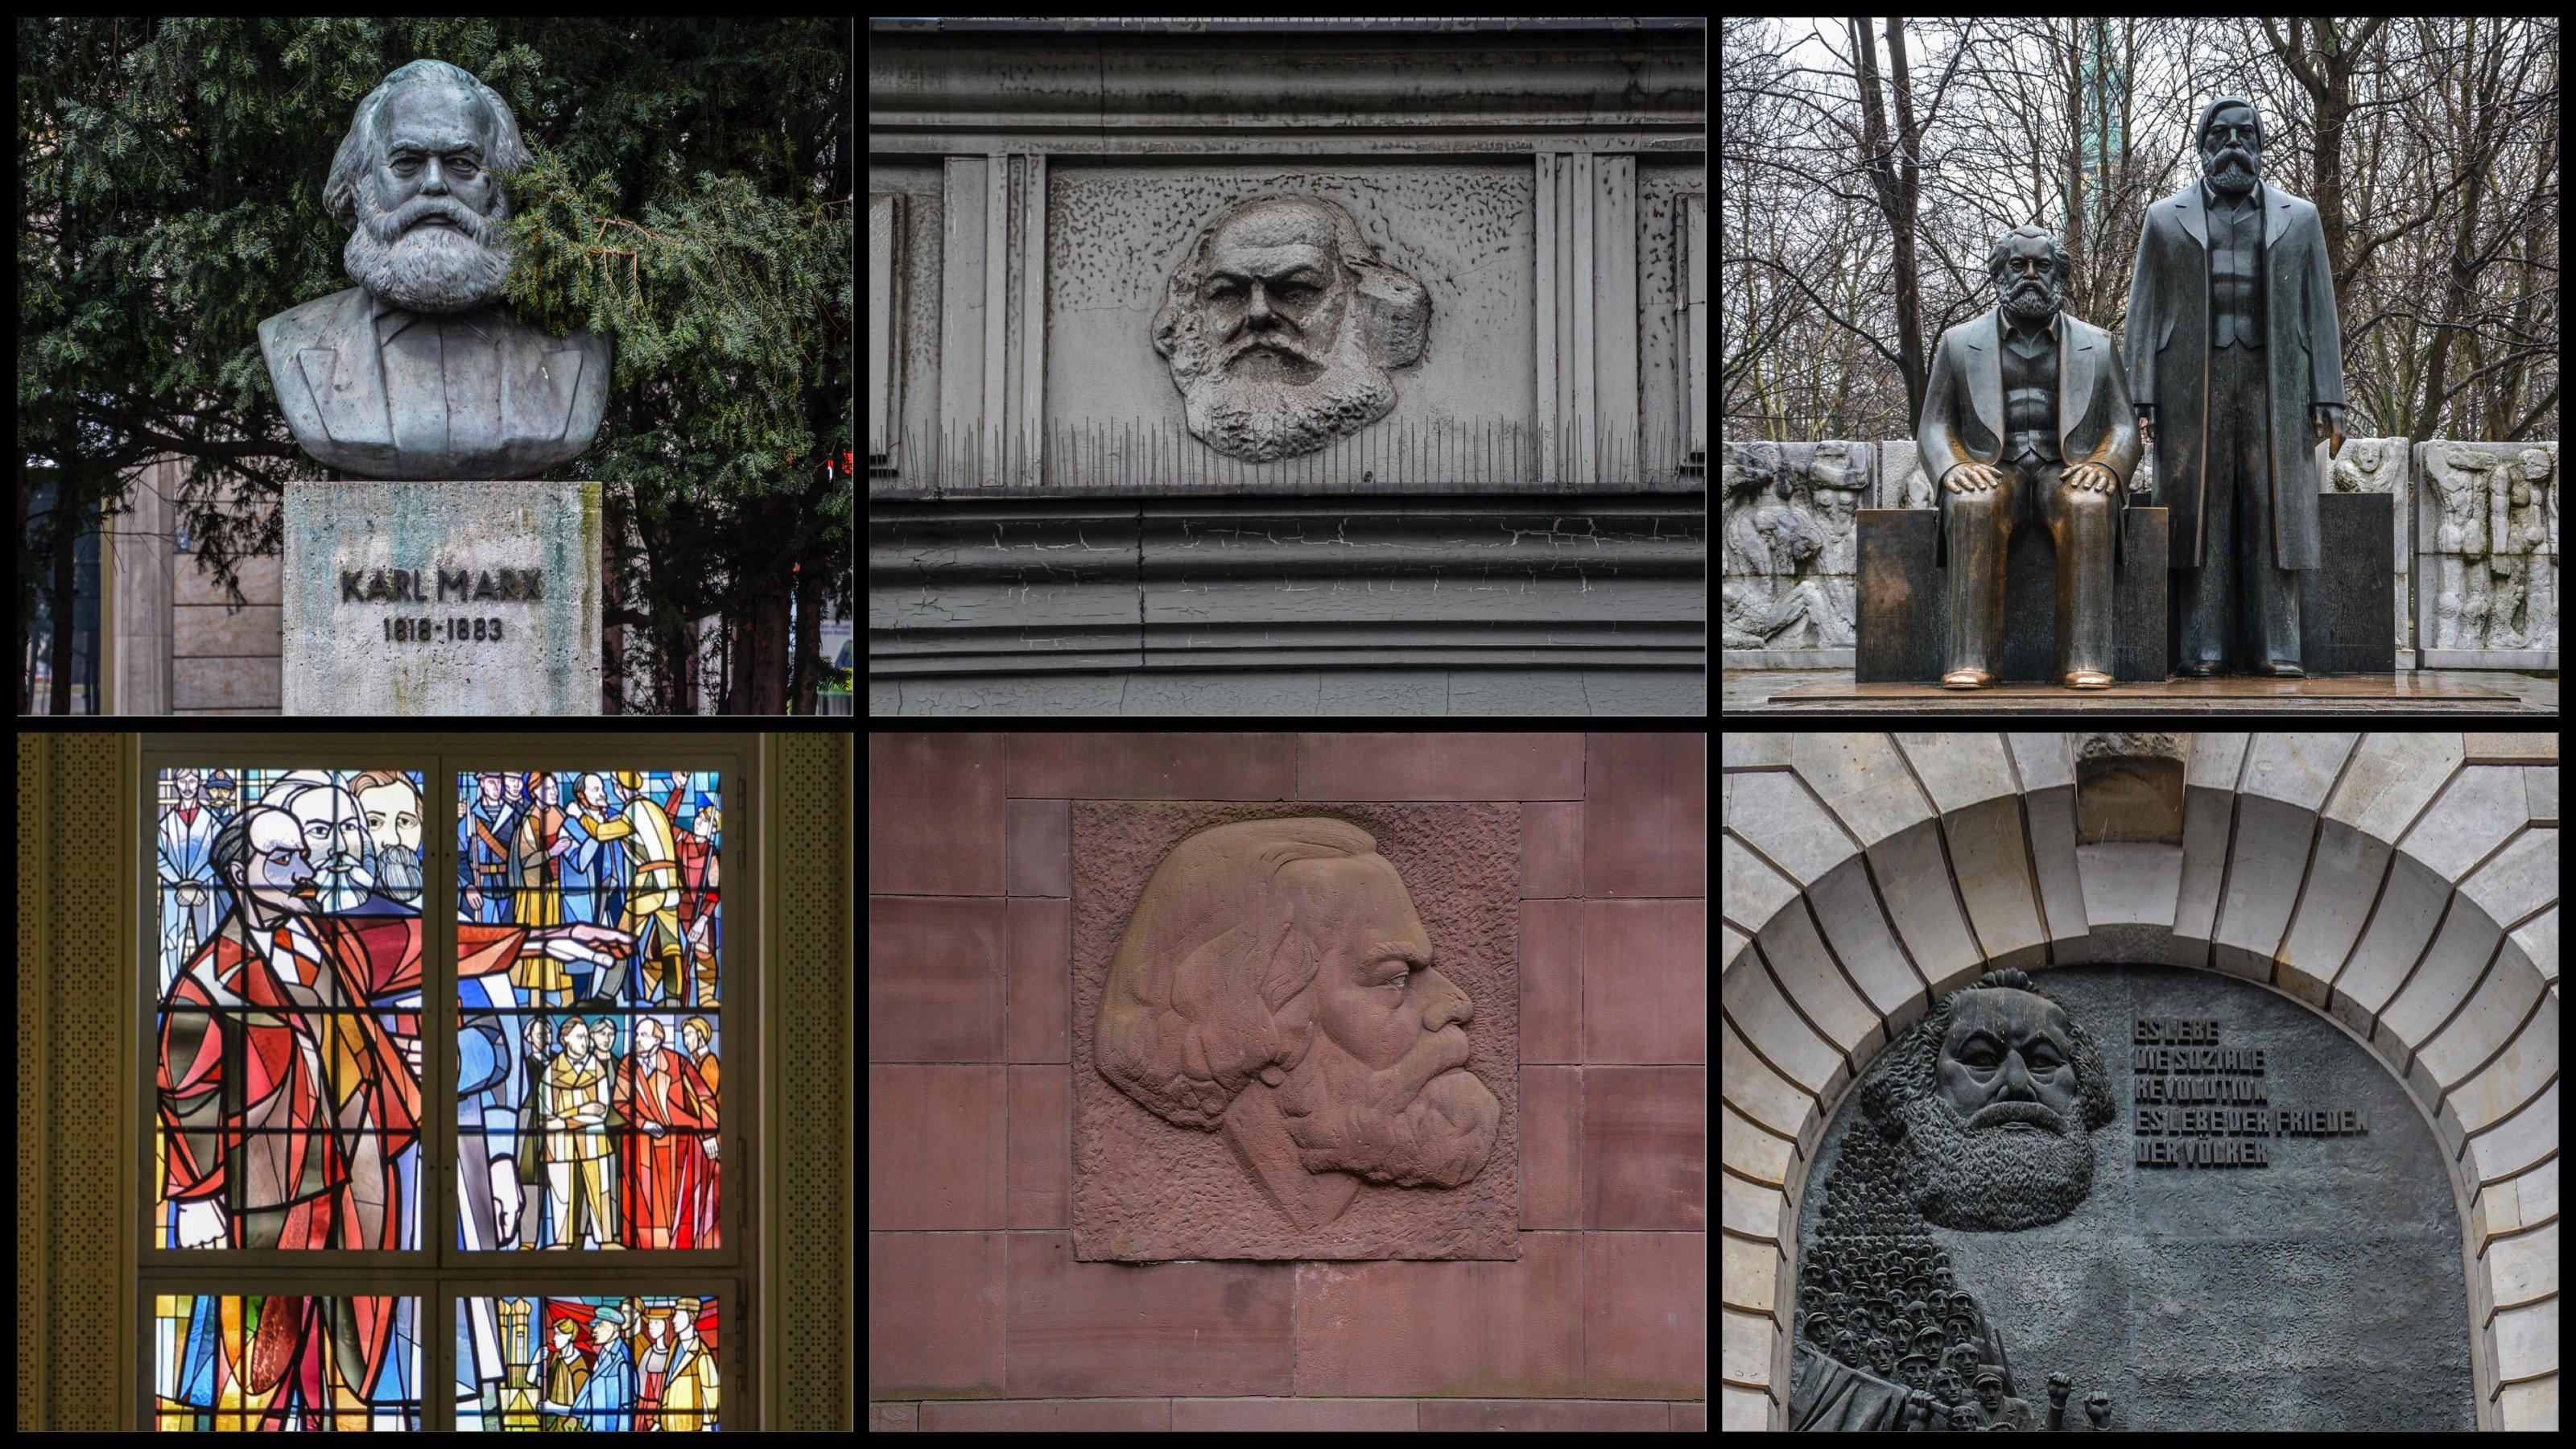 karl marx berlin germany collage